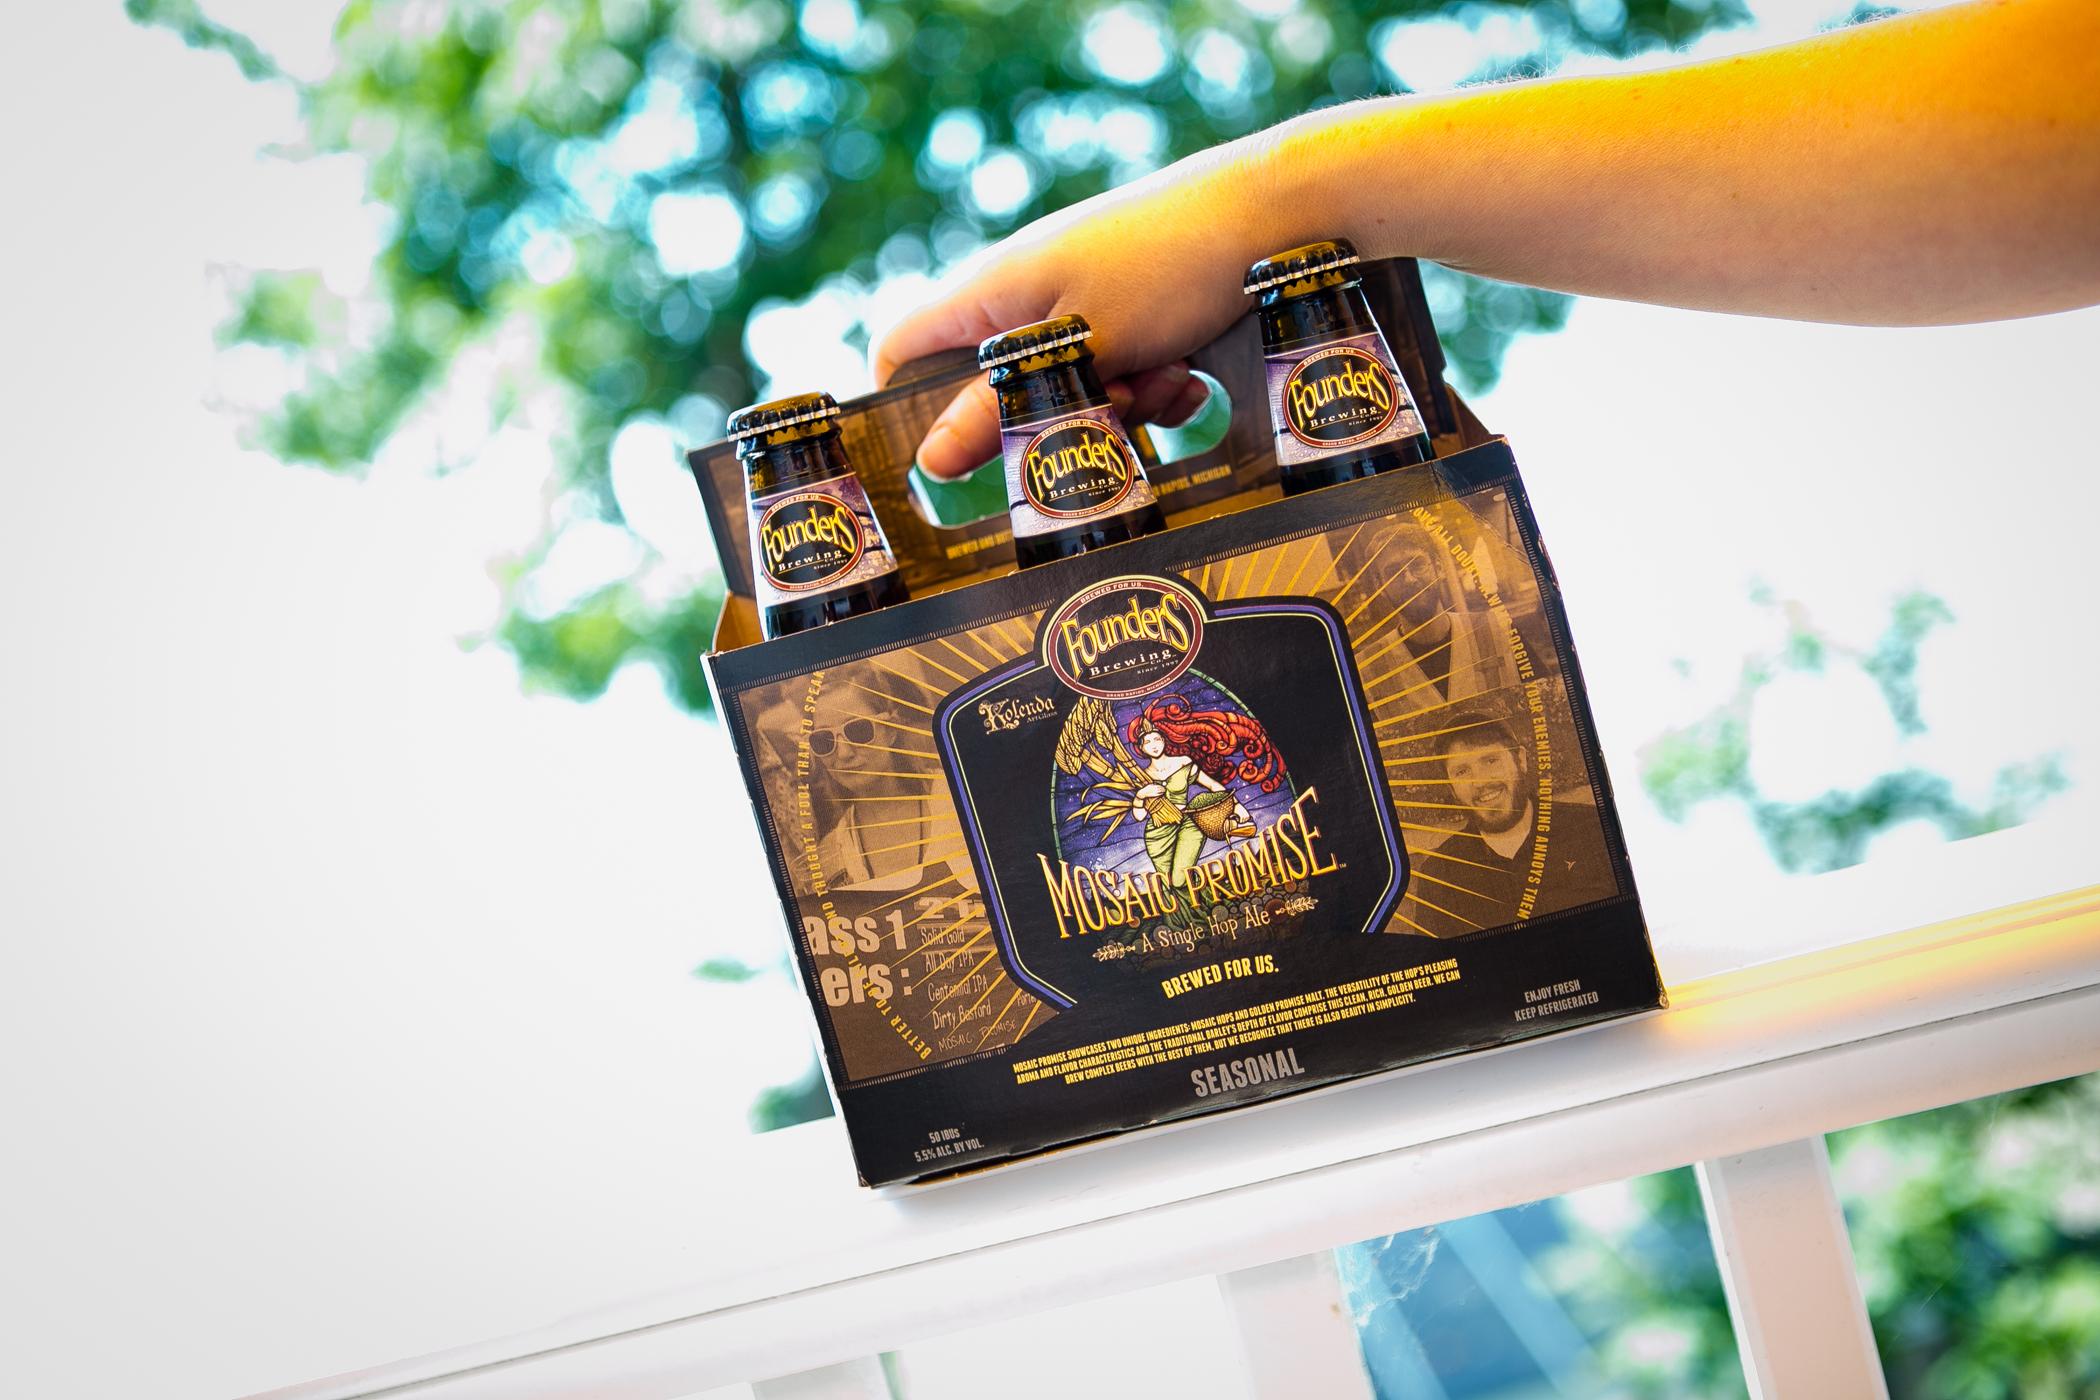 Founders Mosaic Promise, a seasonal, golden single hop pale ale.